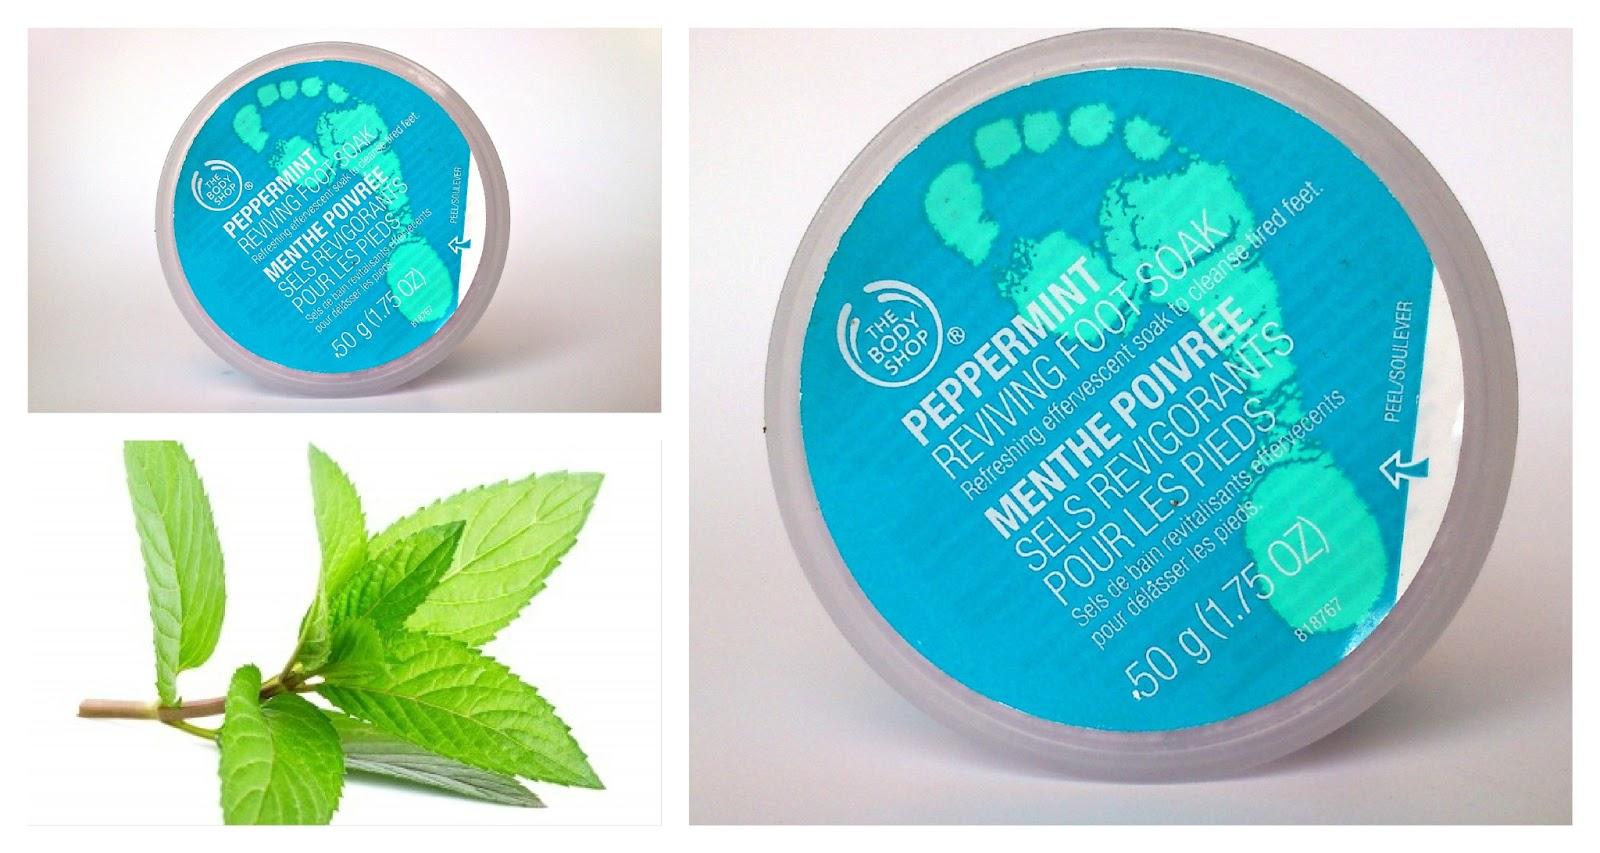 The Body Shop - Peppermint Reviving Foot Soak